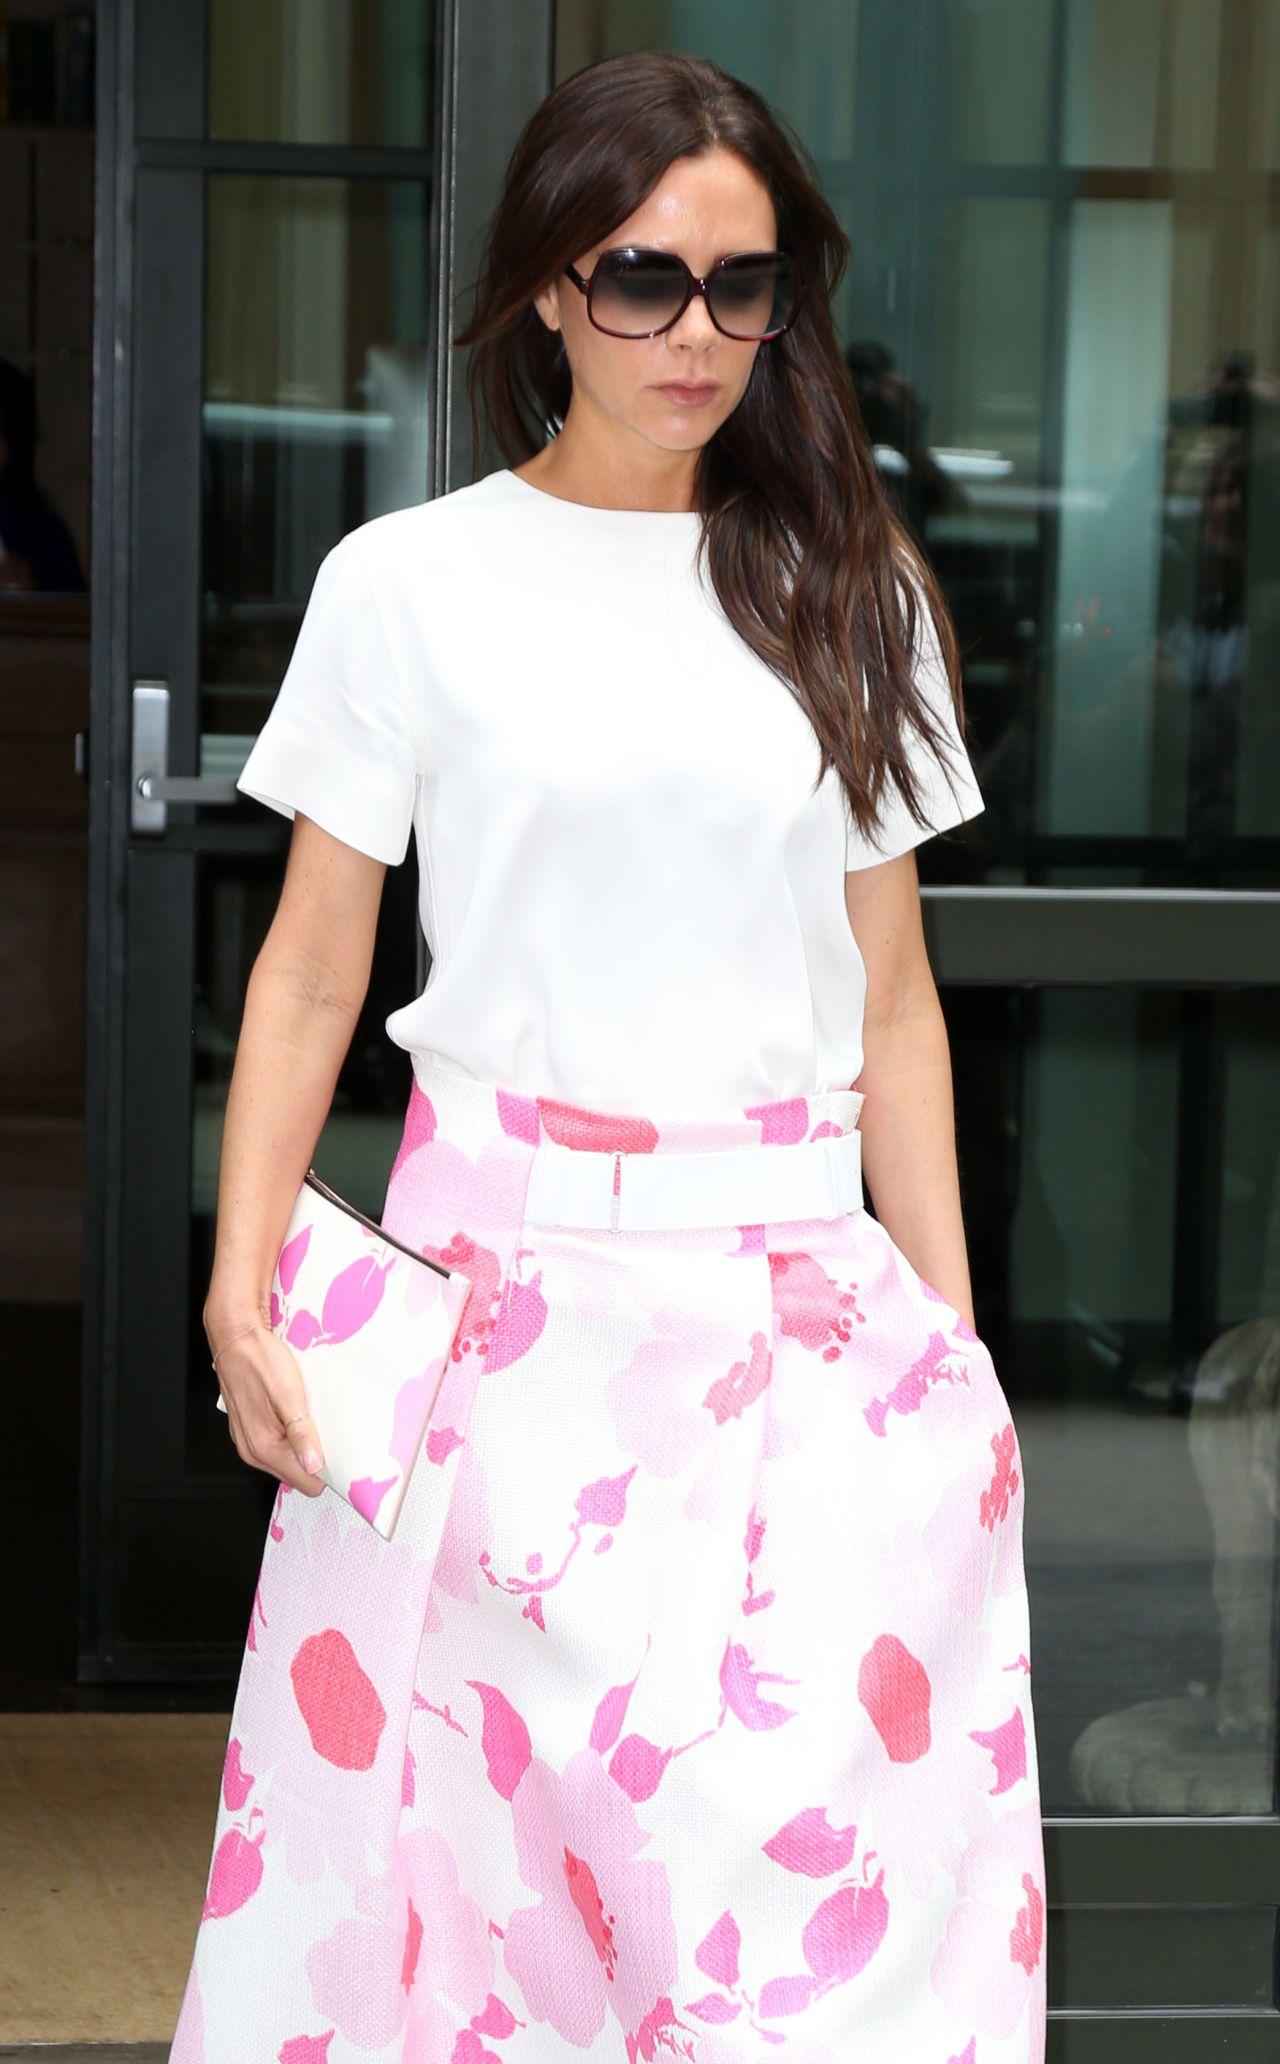 Victoria Beckham Street Style - Leaving Her Hotel in New ... Victoria Beckham